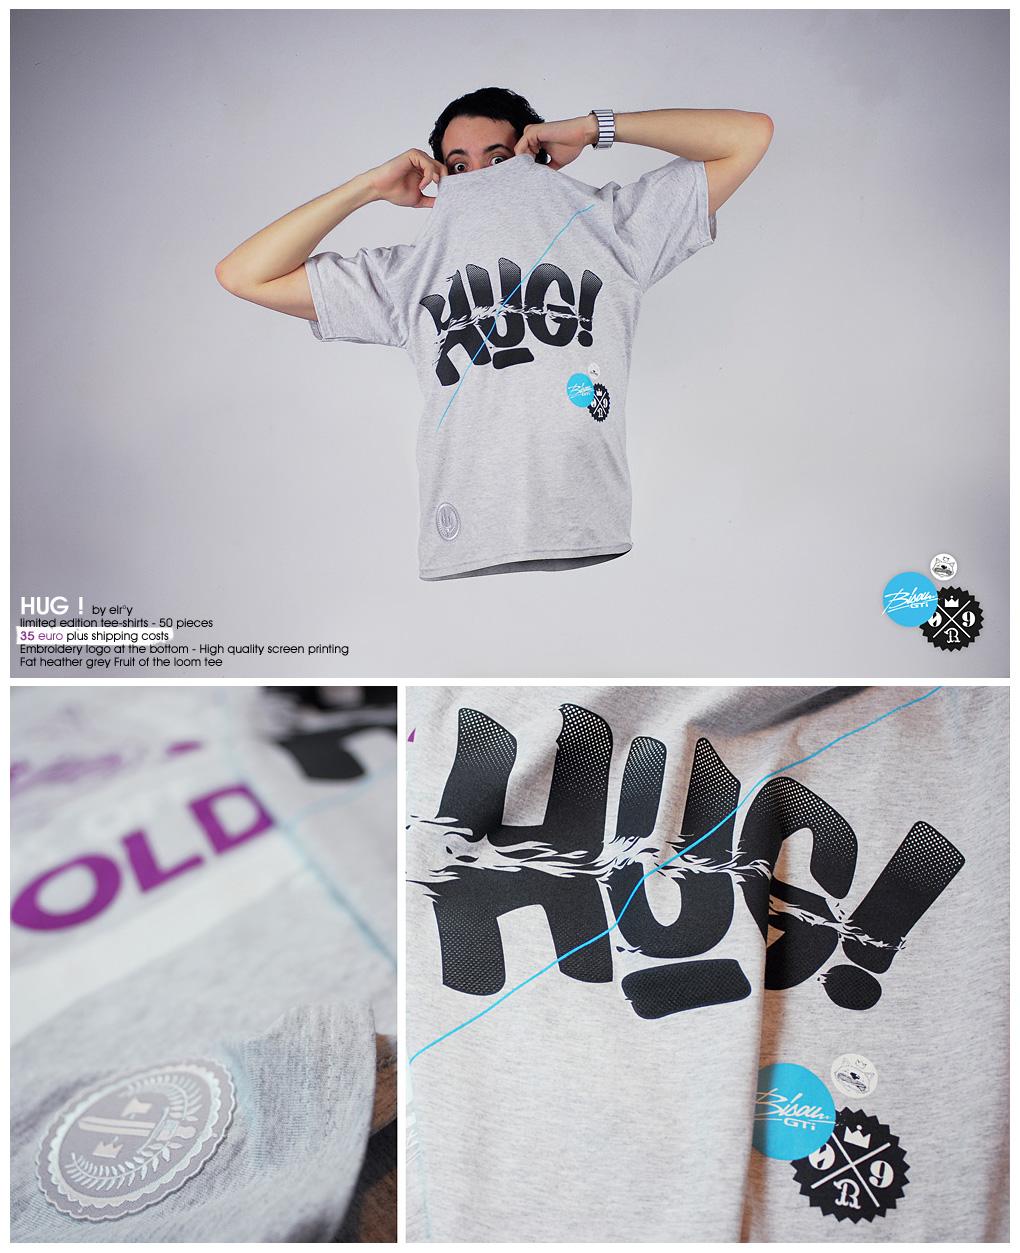 HUG Tee shirt release by incogburo